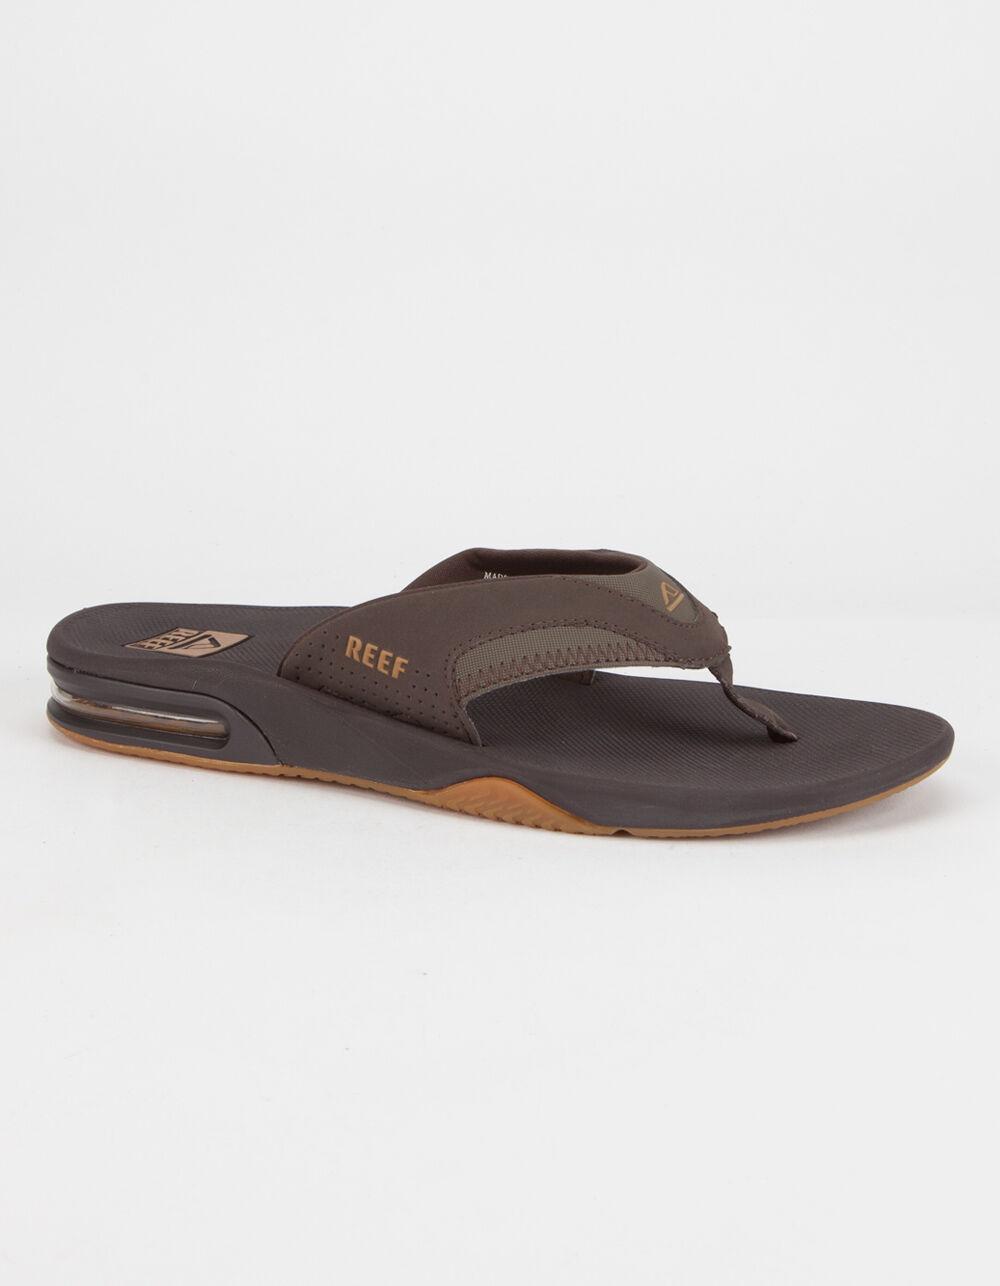 REEF Fanning Sandals